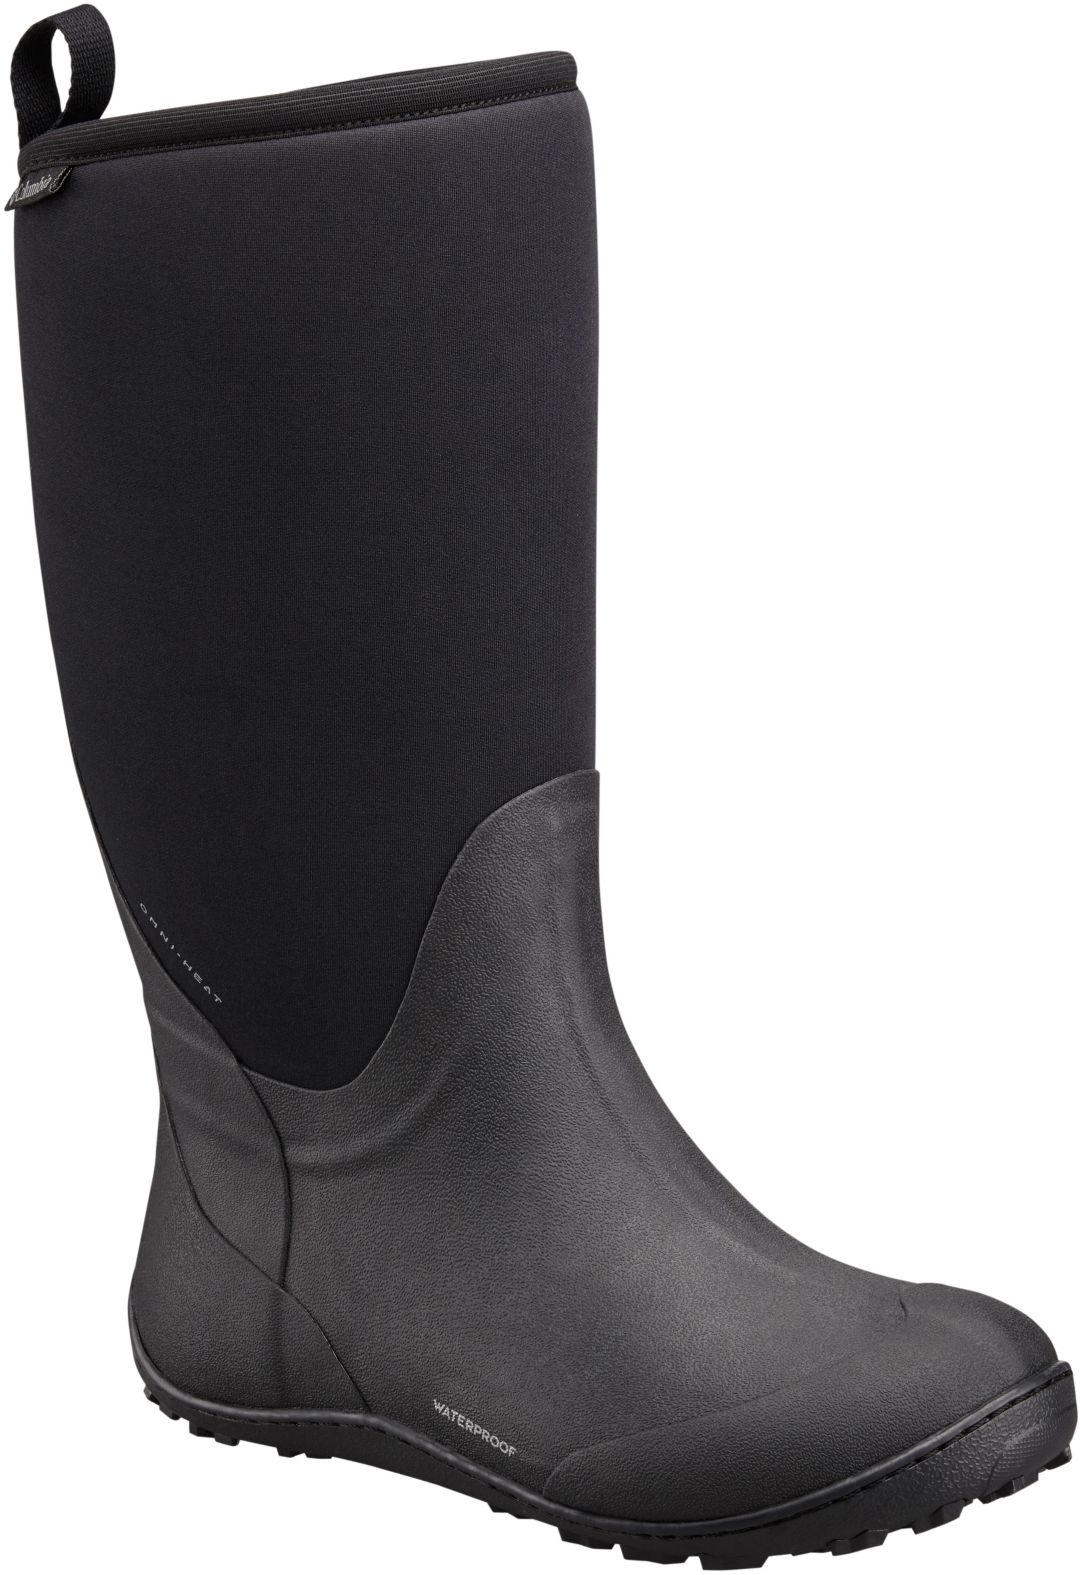 47e19330d Columbia Women's Snowpow Tall Omni-Heat Winter Boots